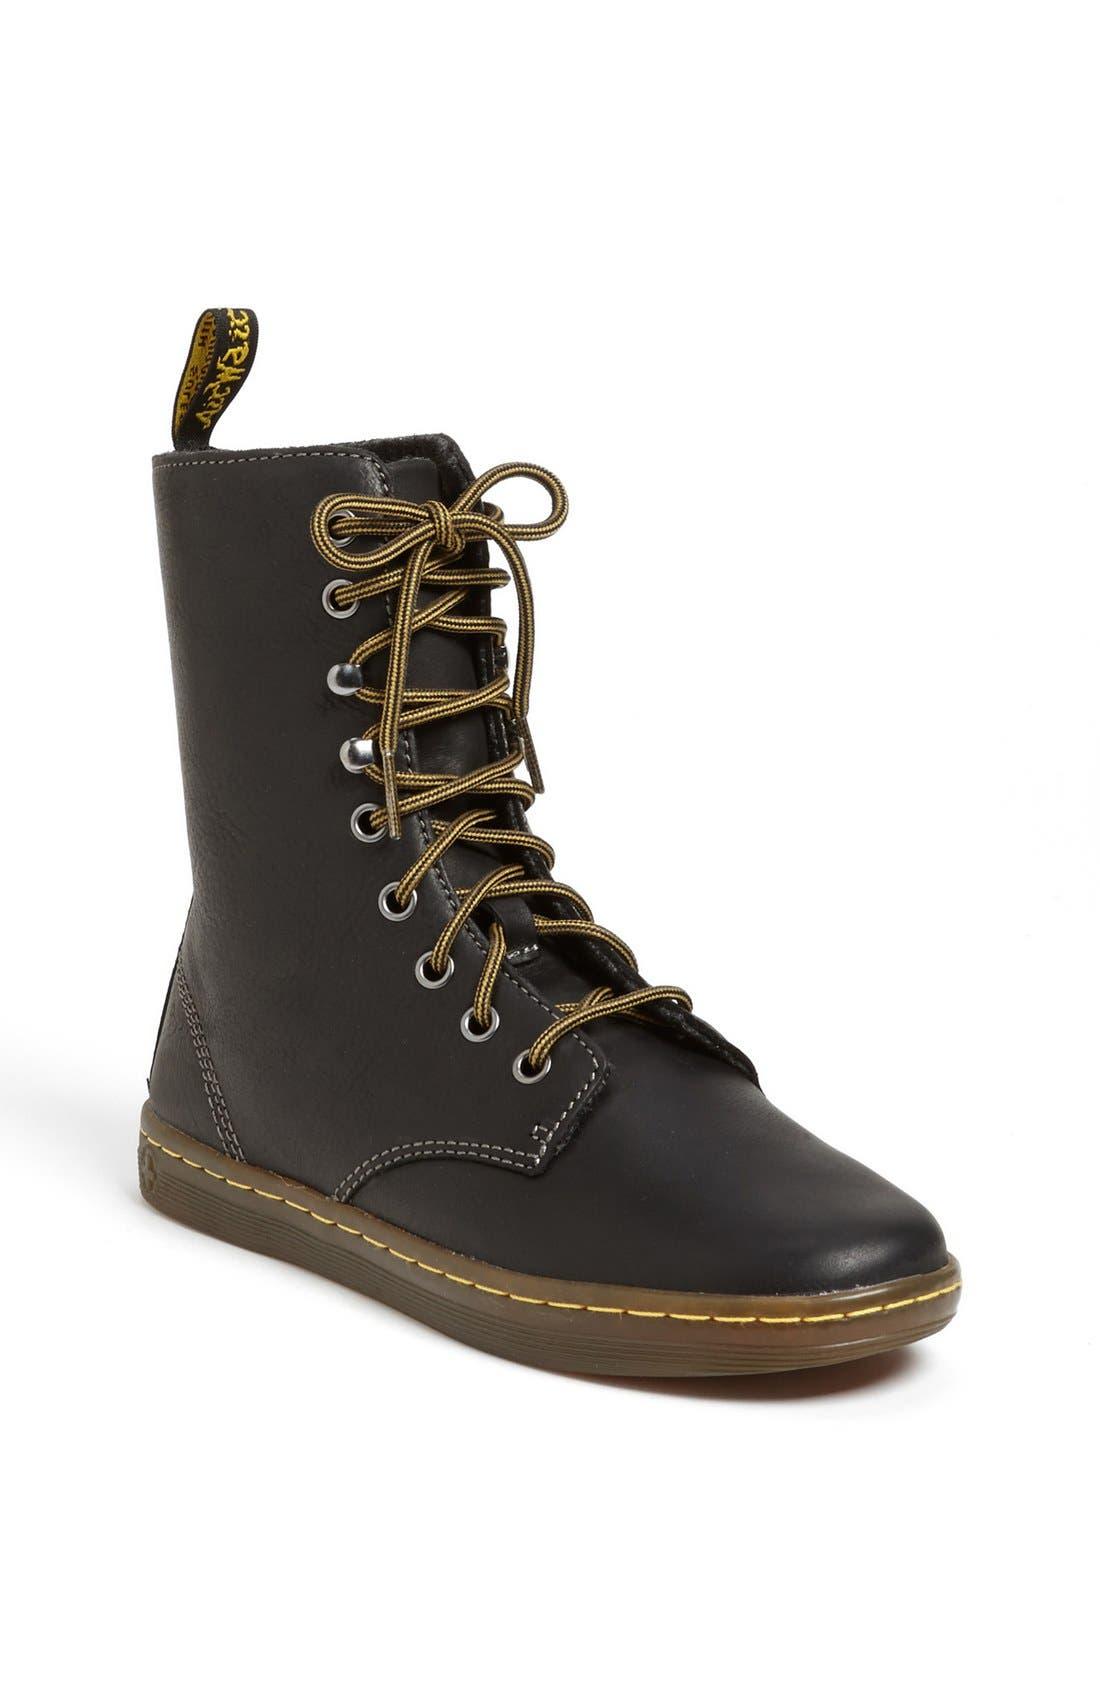 Alternate Image 1 Selected - Dr. Martens 'Tehani' Boot